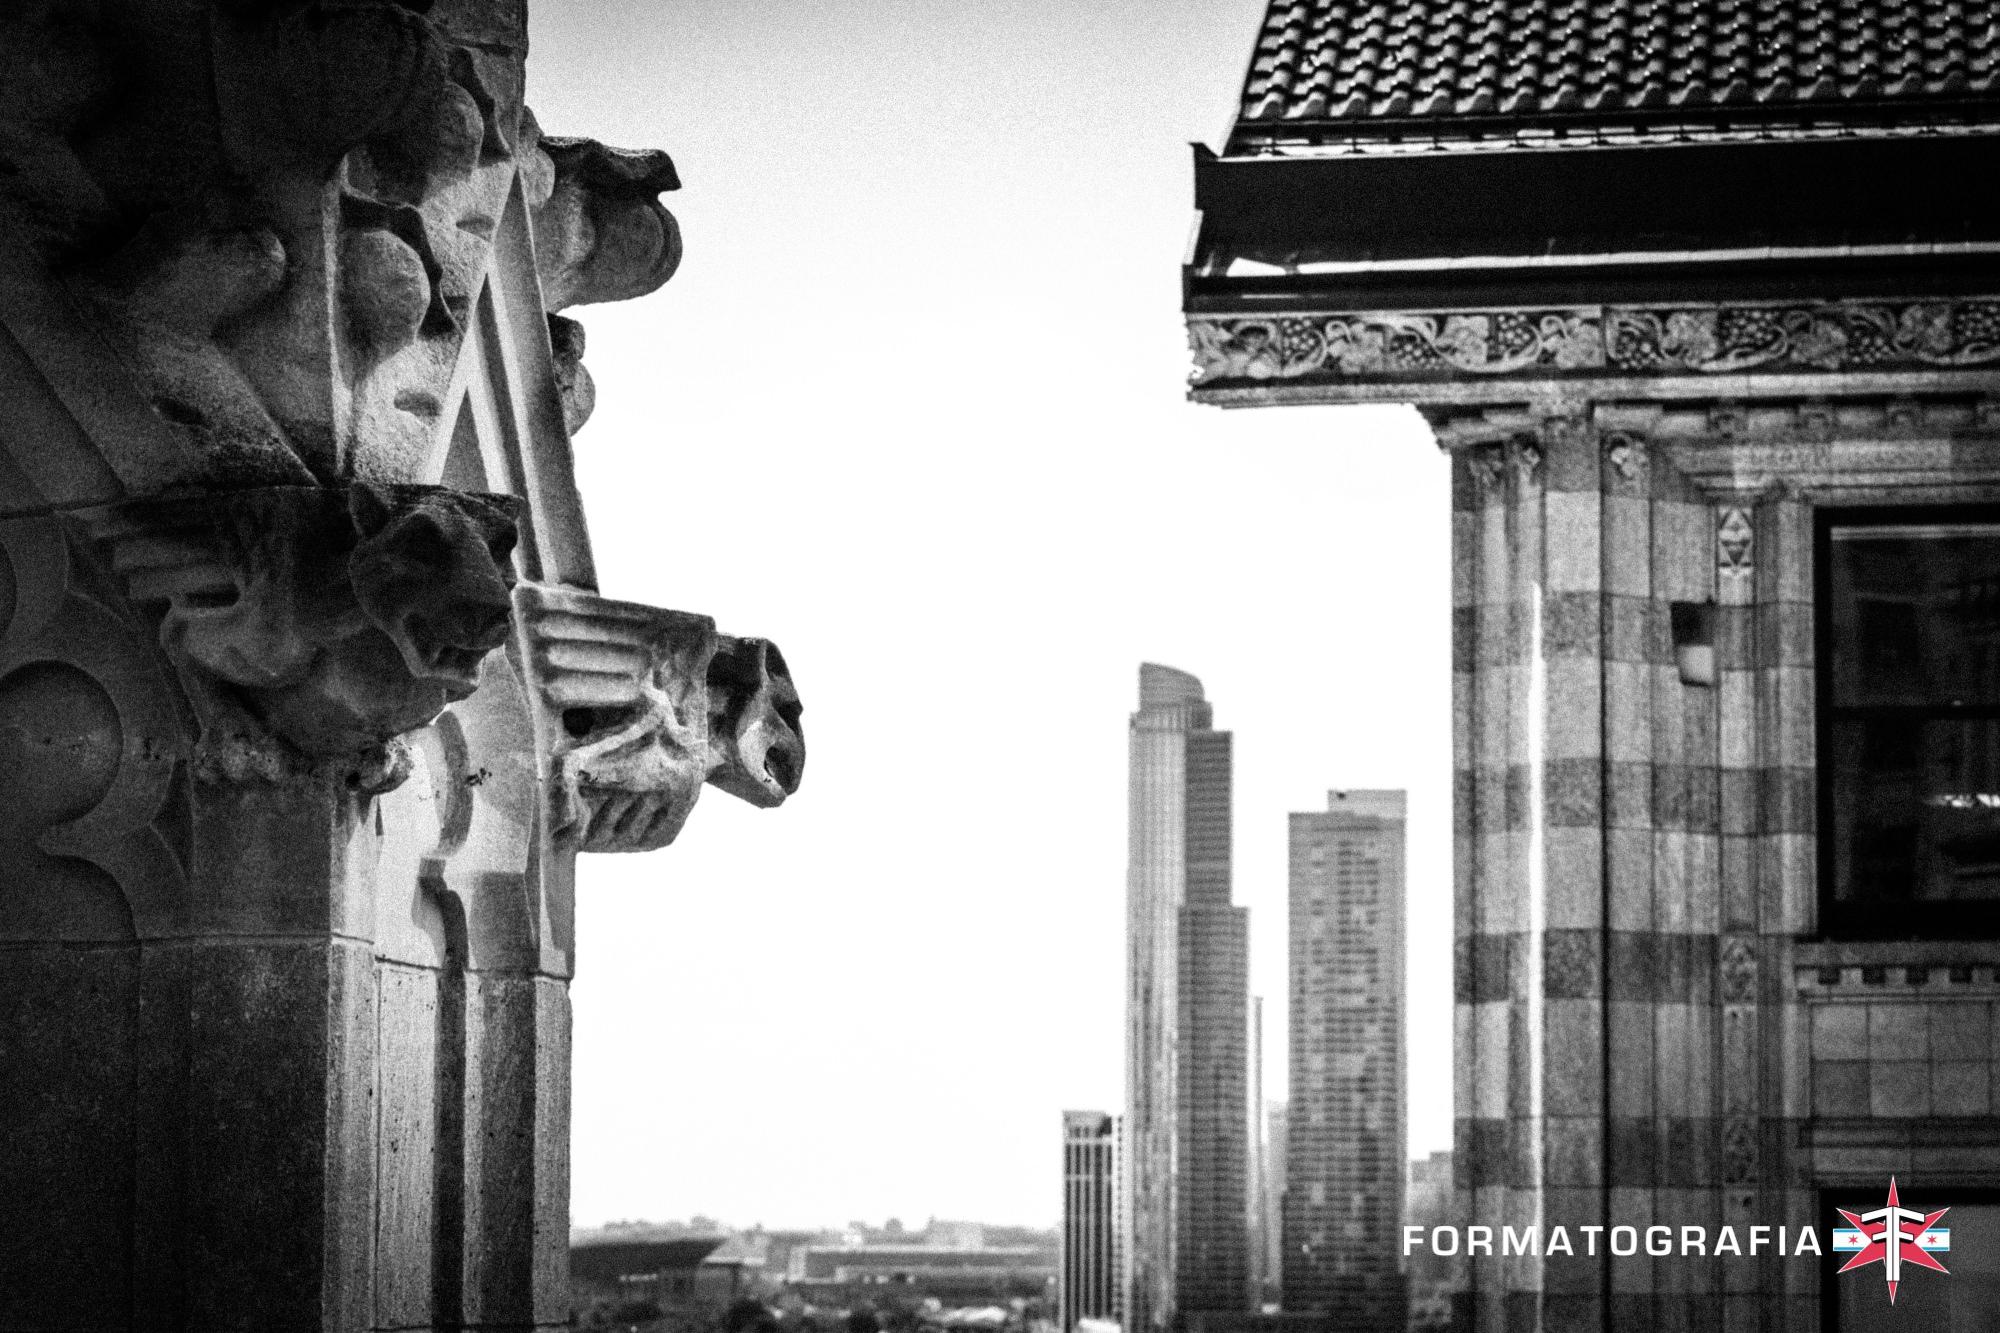 eric formato chicago photographer fall update city architecture shotsDSC_0348-2.jpg